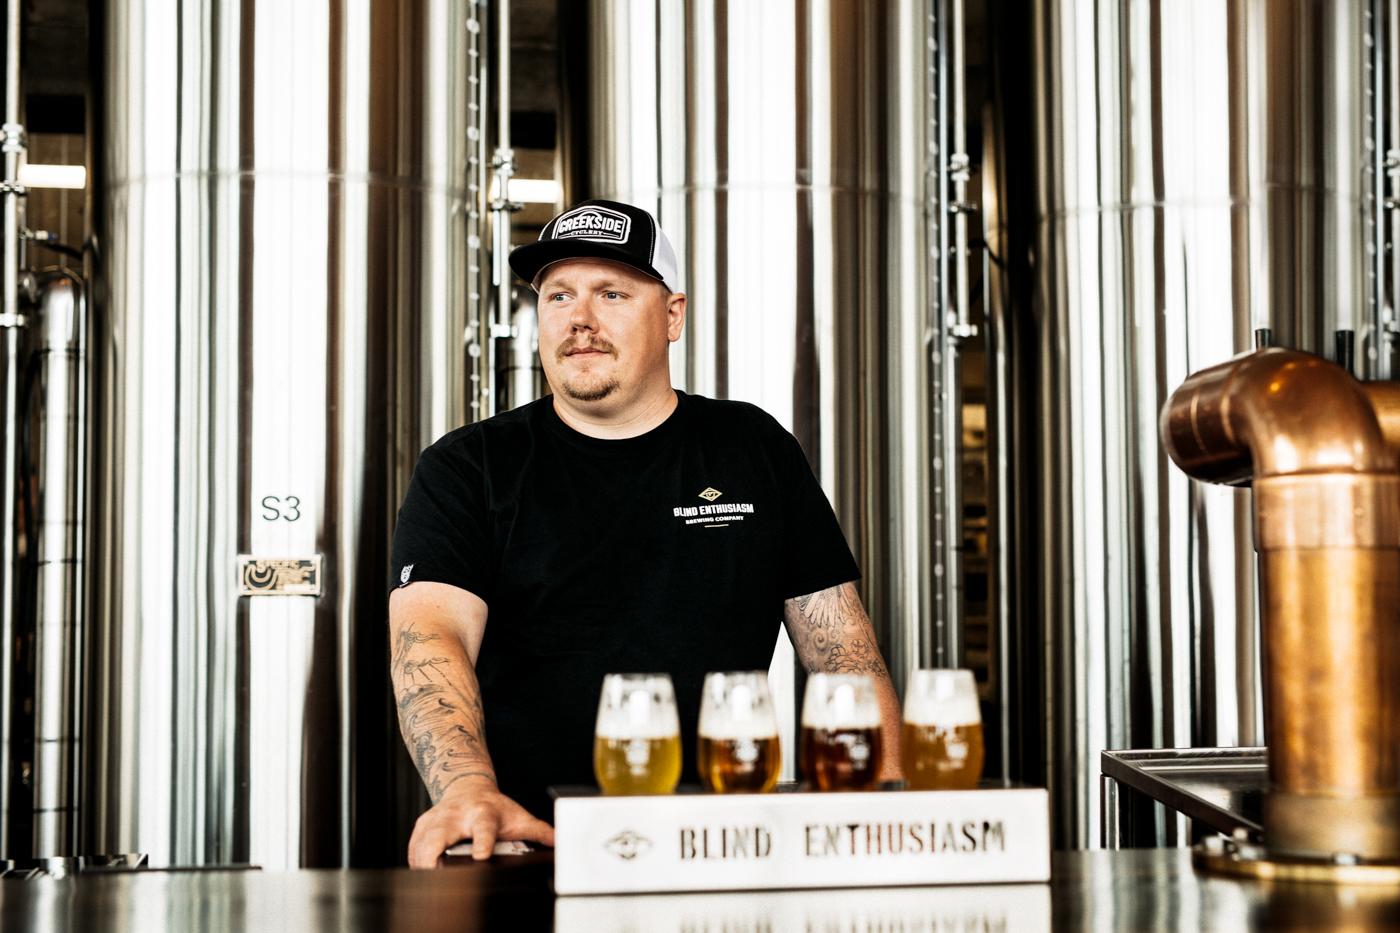 Biera-Blind-Enthusiasm-Brewery-Edmonton-Portrait-Photography_O6A4043-Edit-Hi-Res.jpg